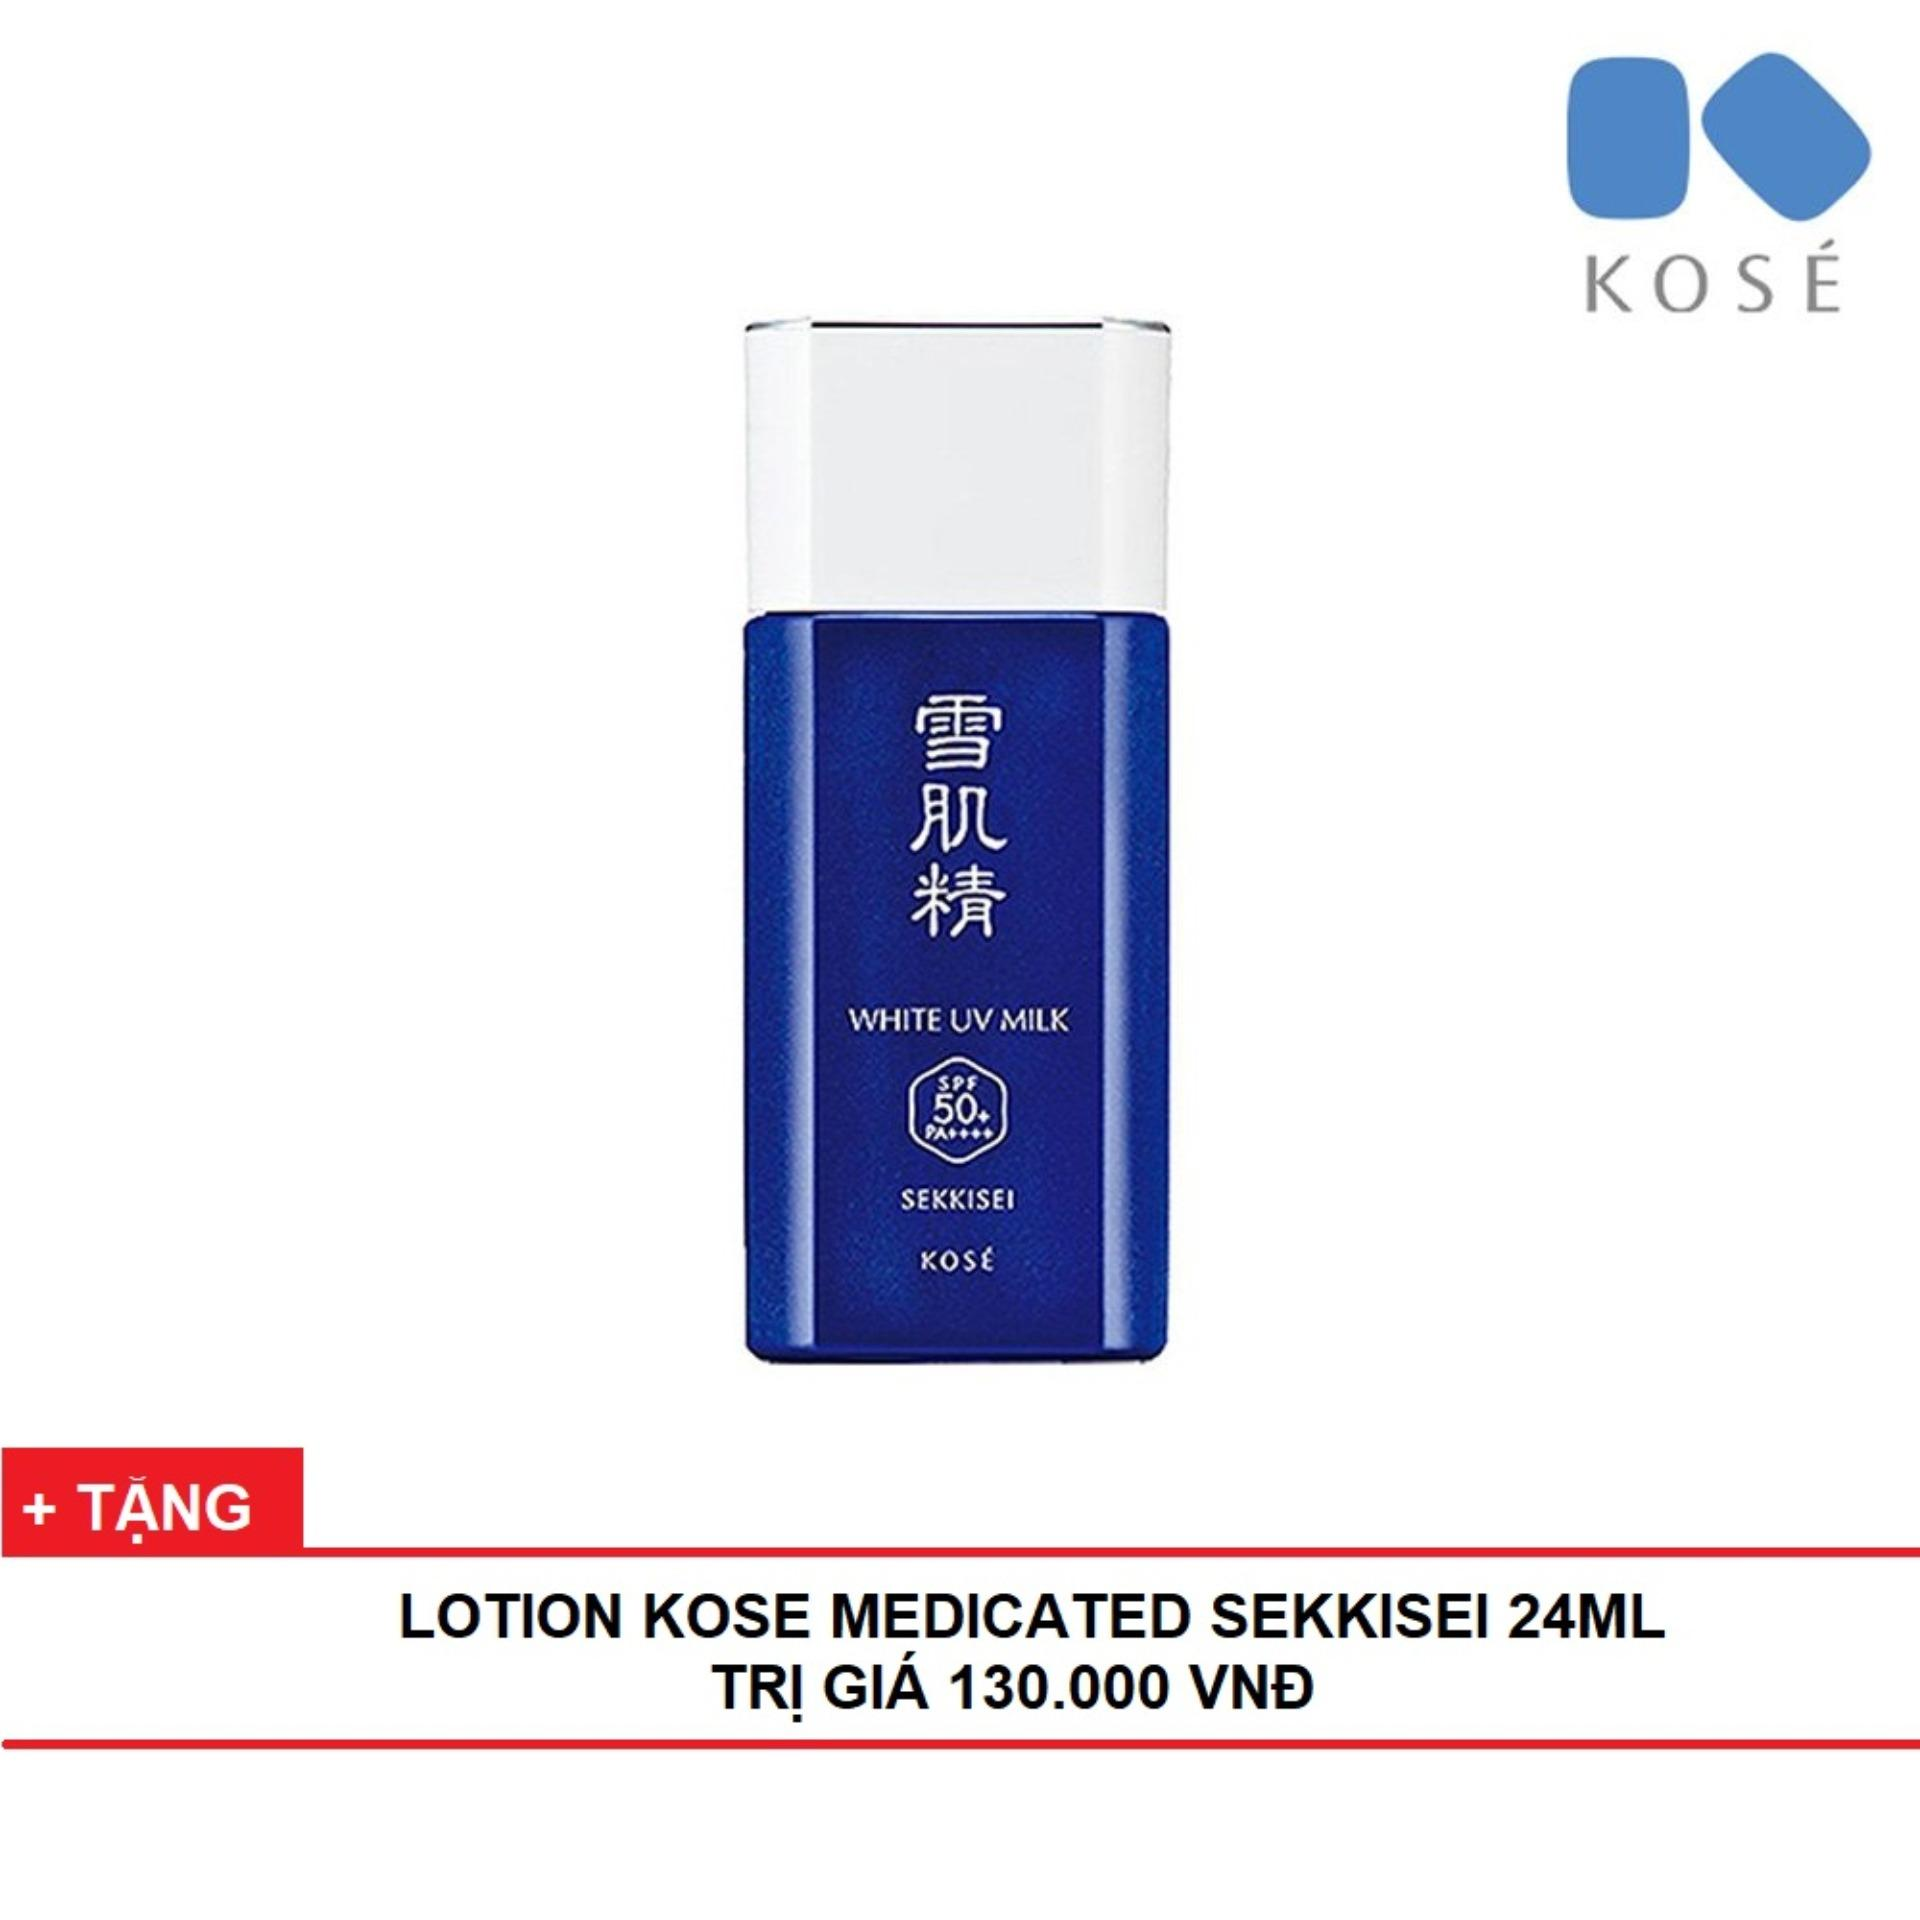 Kem Chống Nắng Kose Sekkisei White UV Milk - 60 gram - TITIAN (Mẫu Mới) cao cấp